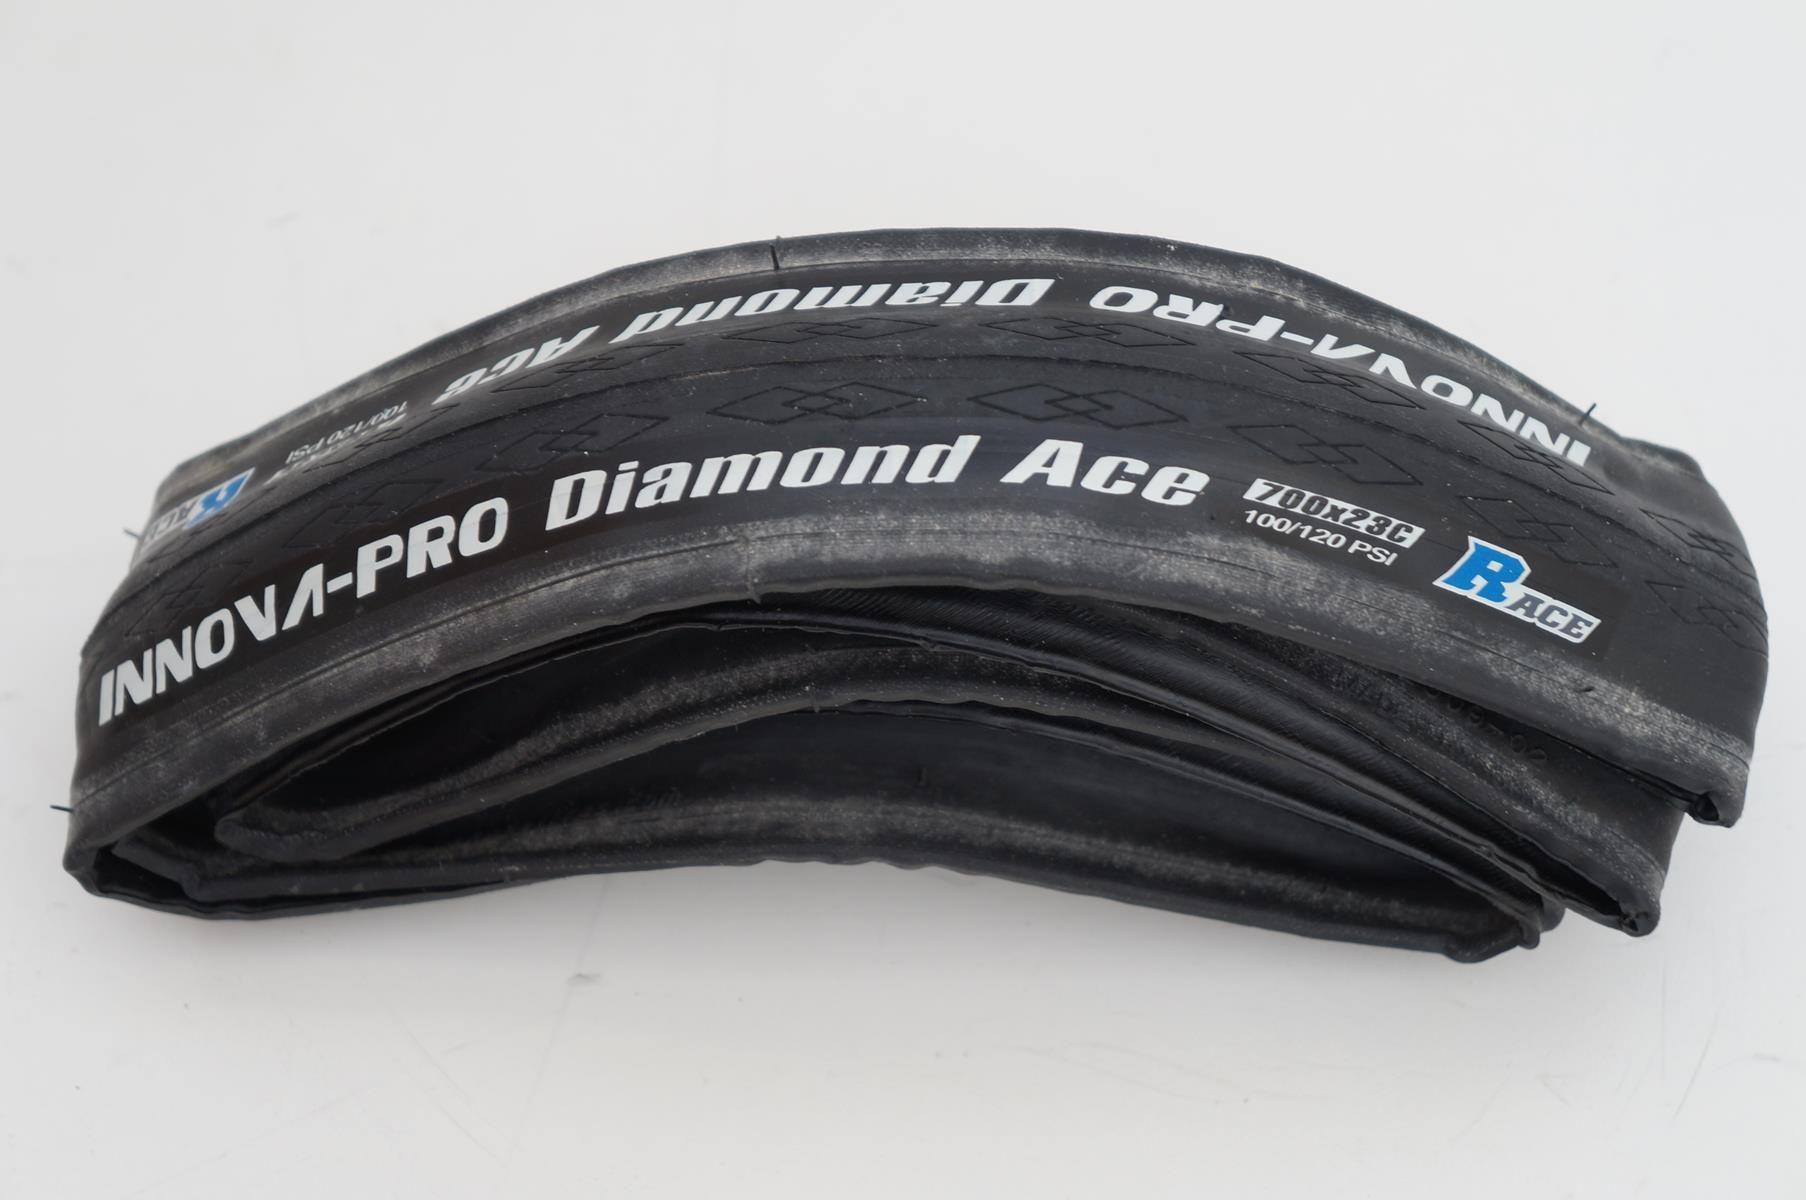 Pneu Innova Pro Diamond Ace 700x23 em Kevlar para Speed Preto